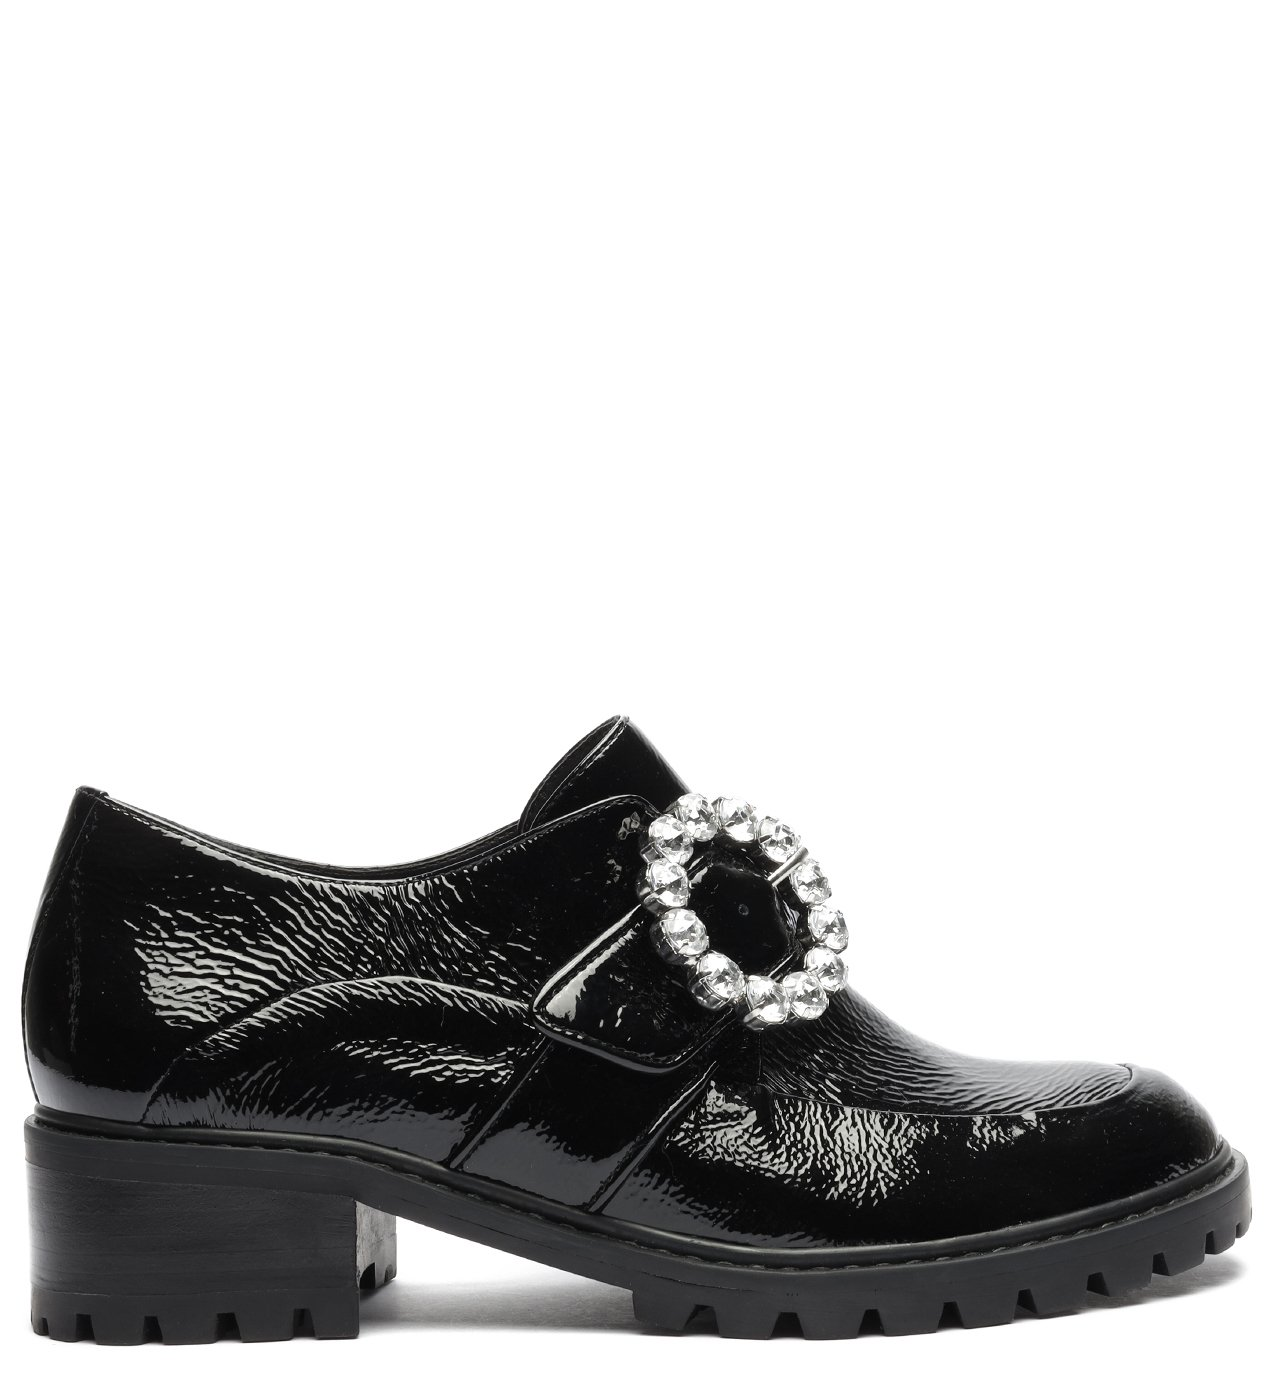 Sapato Oxford Tratorado Verniz Fivela Preto | Schutz